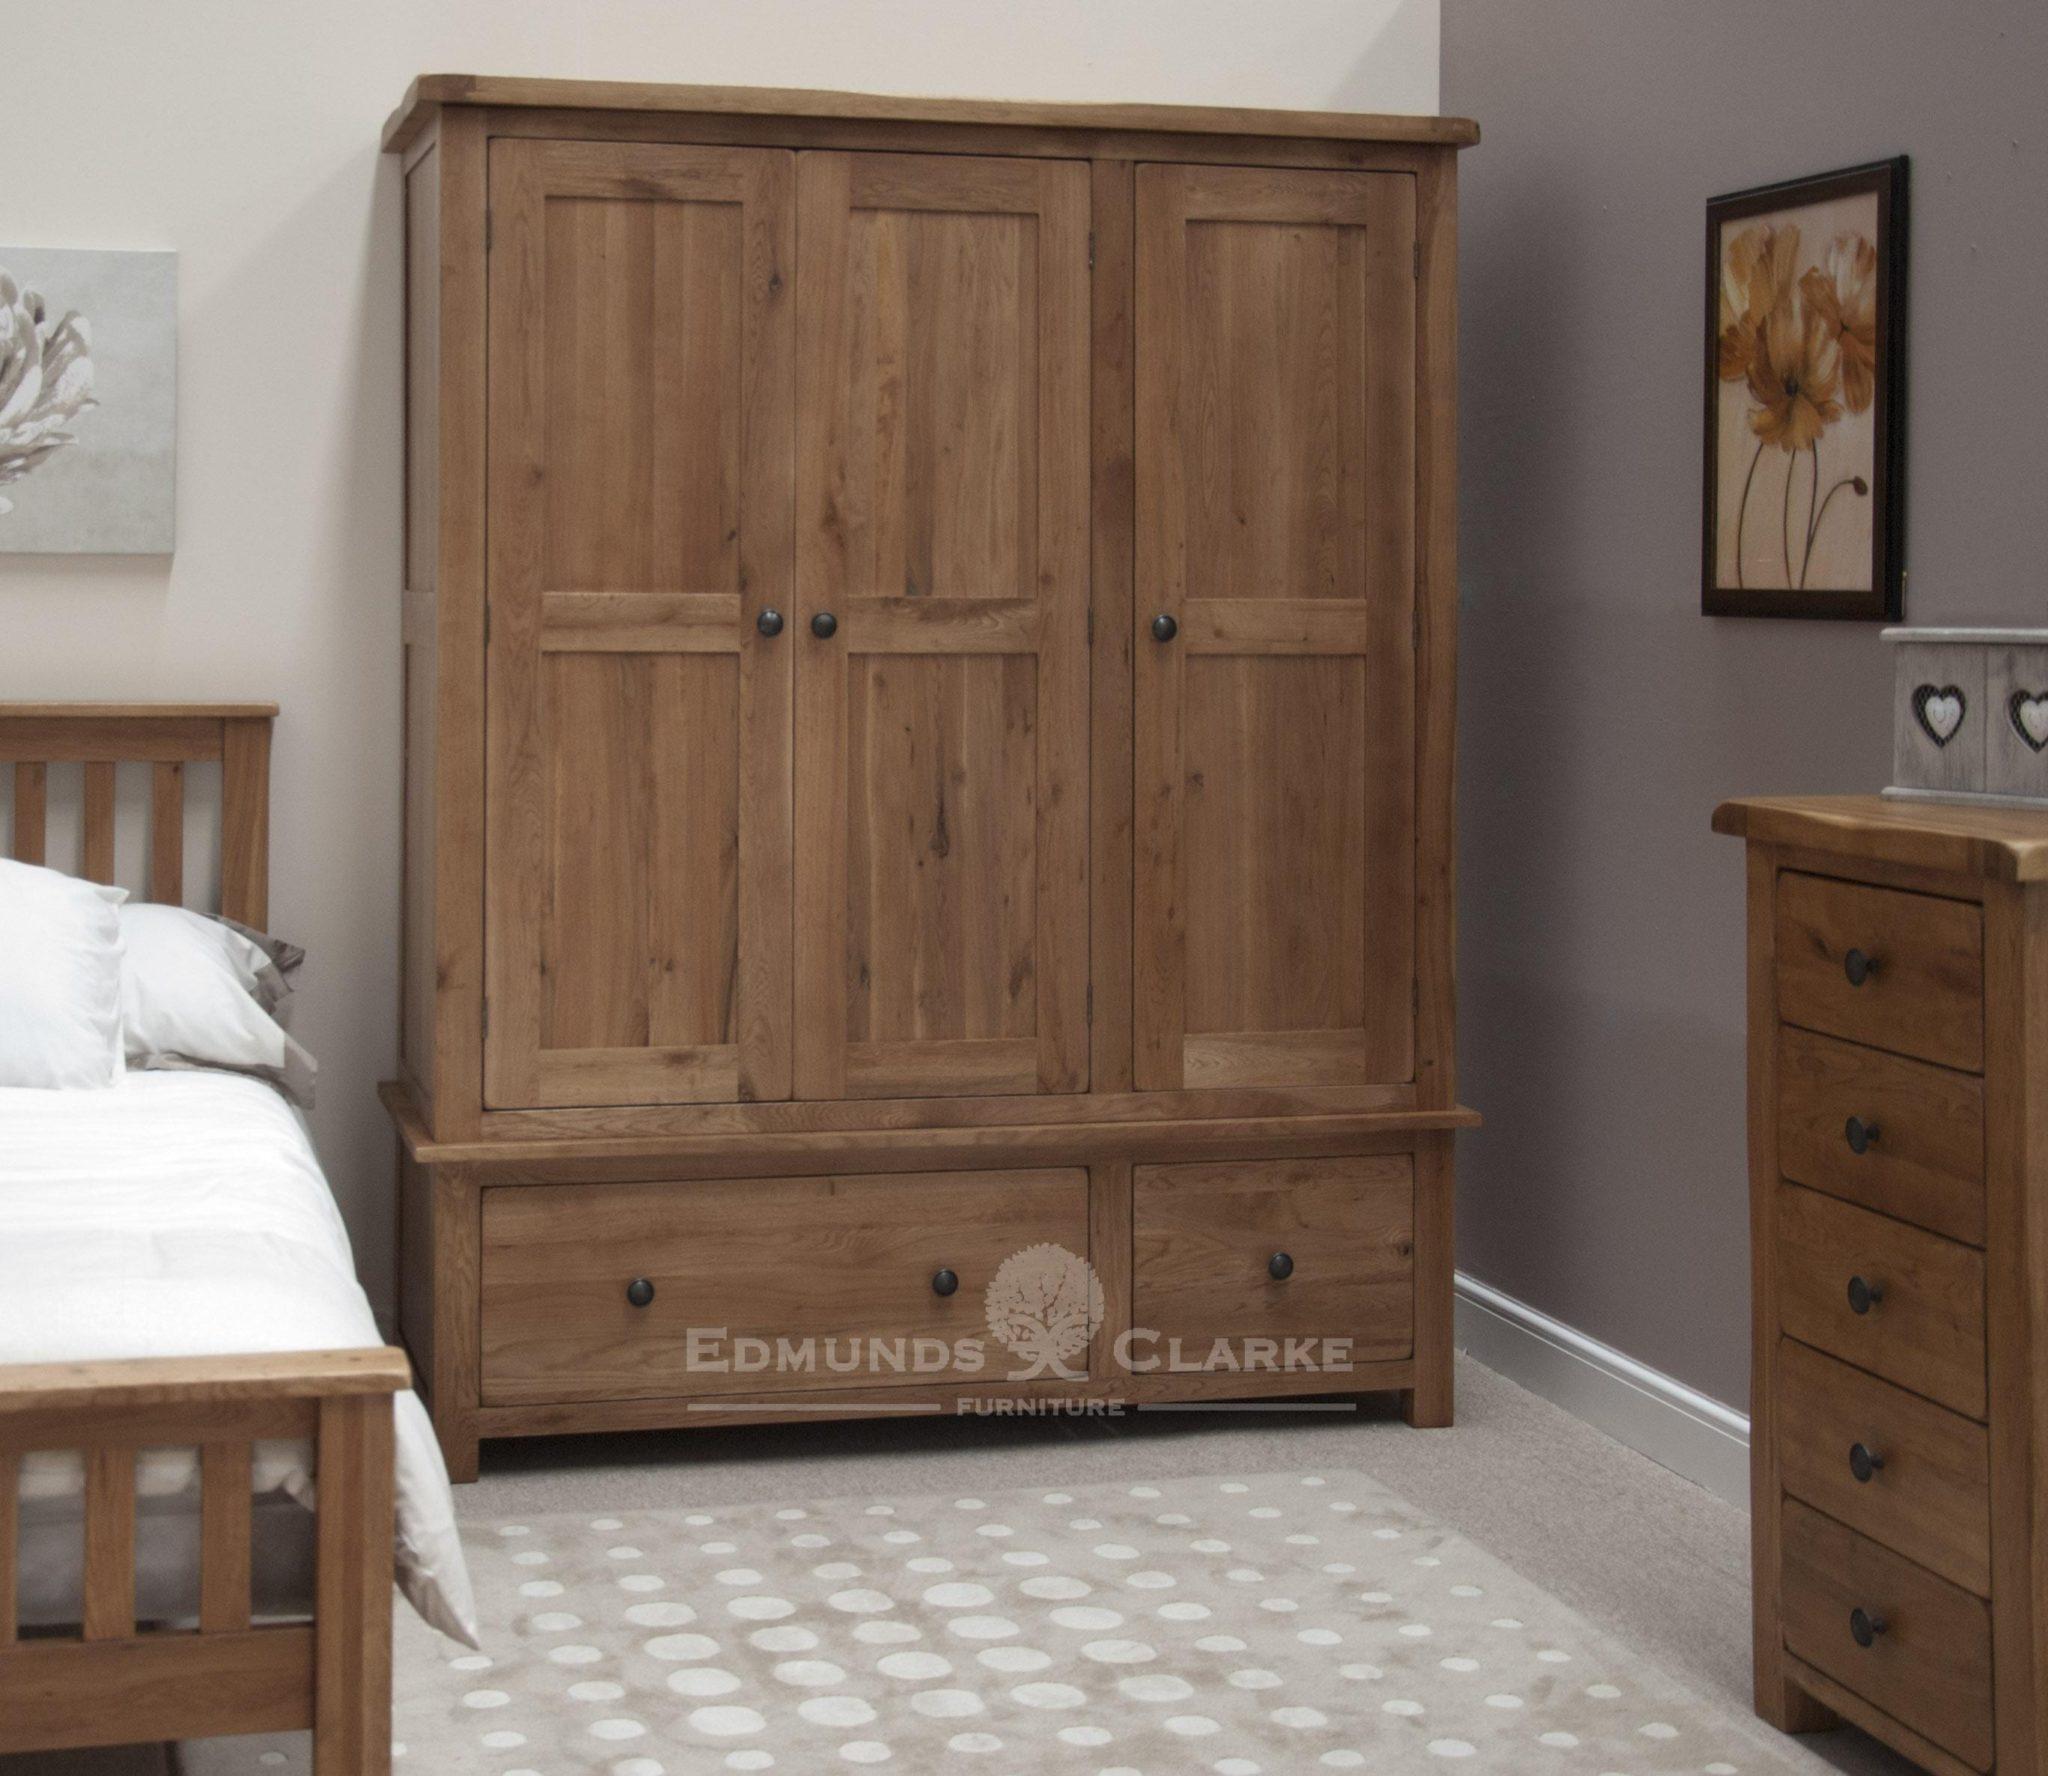 Lavenham solid rustic oak dark large triple wardrobe. with 2 drawers rustic handles, dovetailed joints dark rustic oak